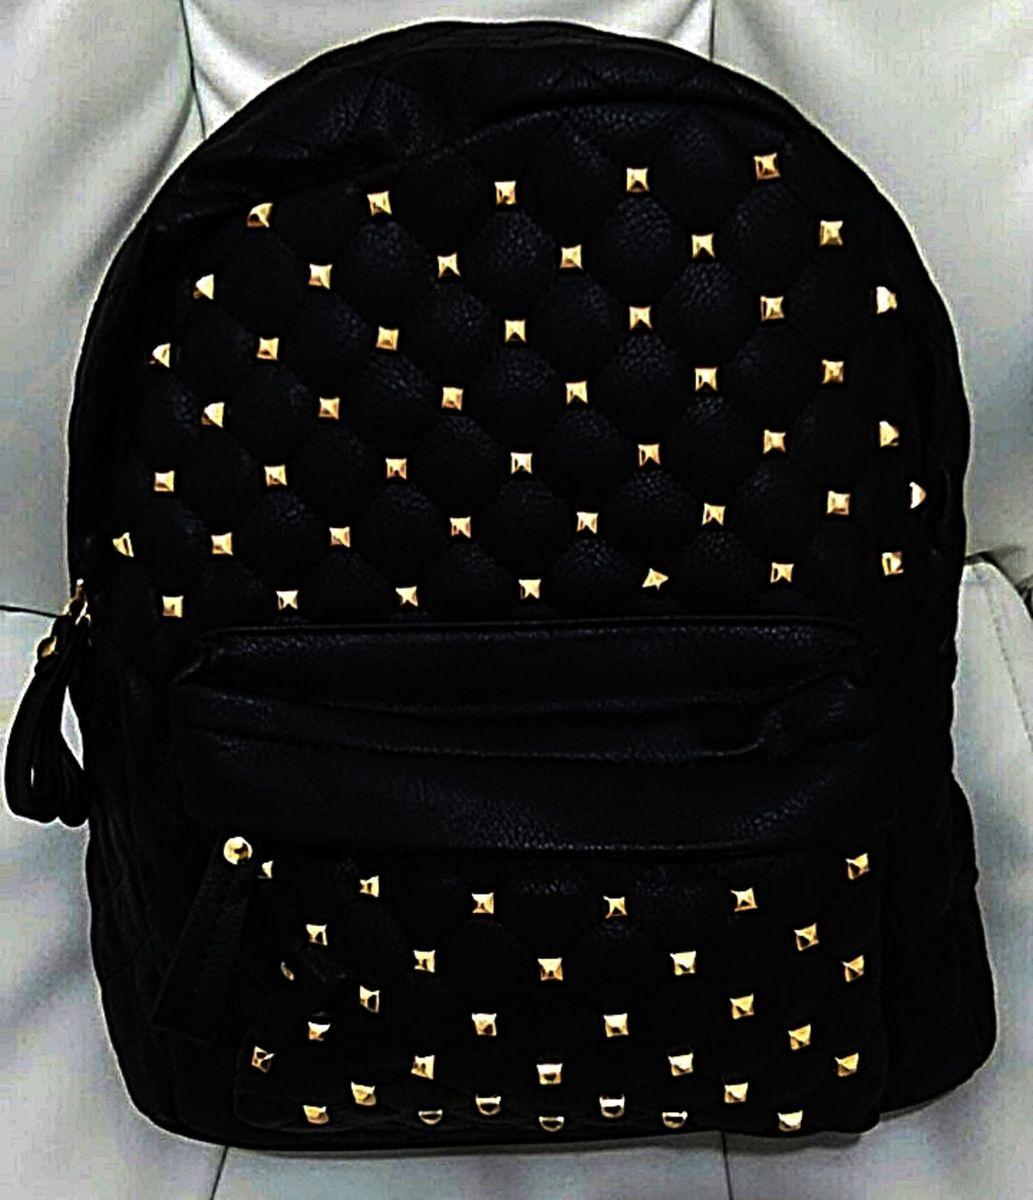 dddeb8569 mochila feminina couro sintético faculdade escola notebook - mochila sem  marca